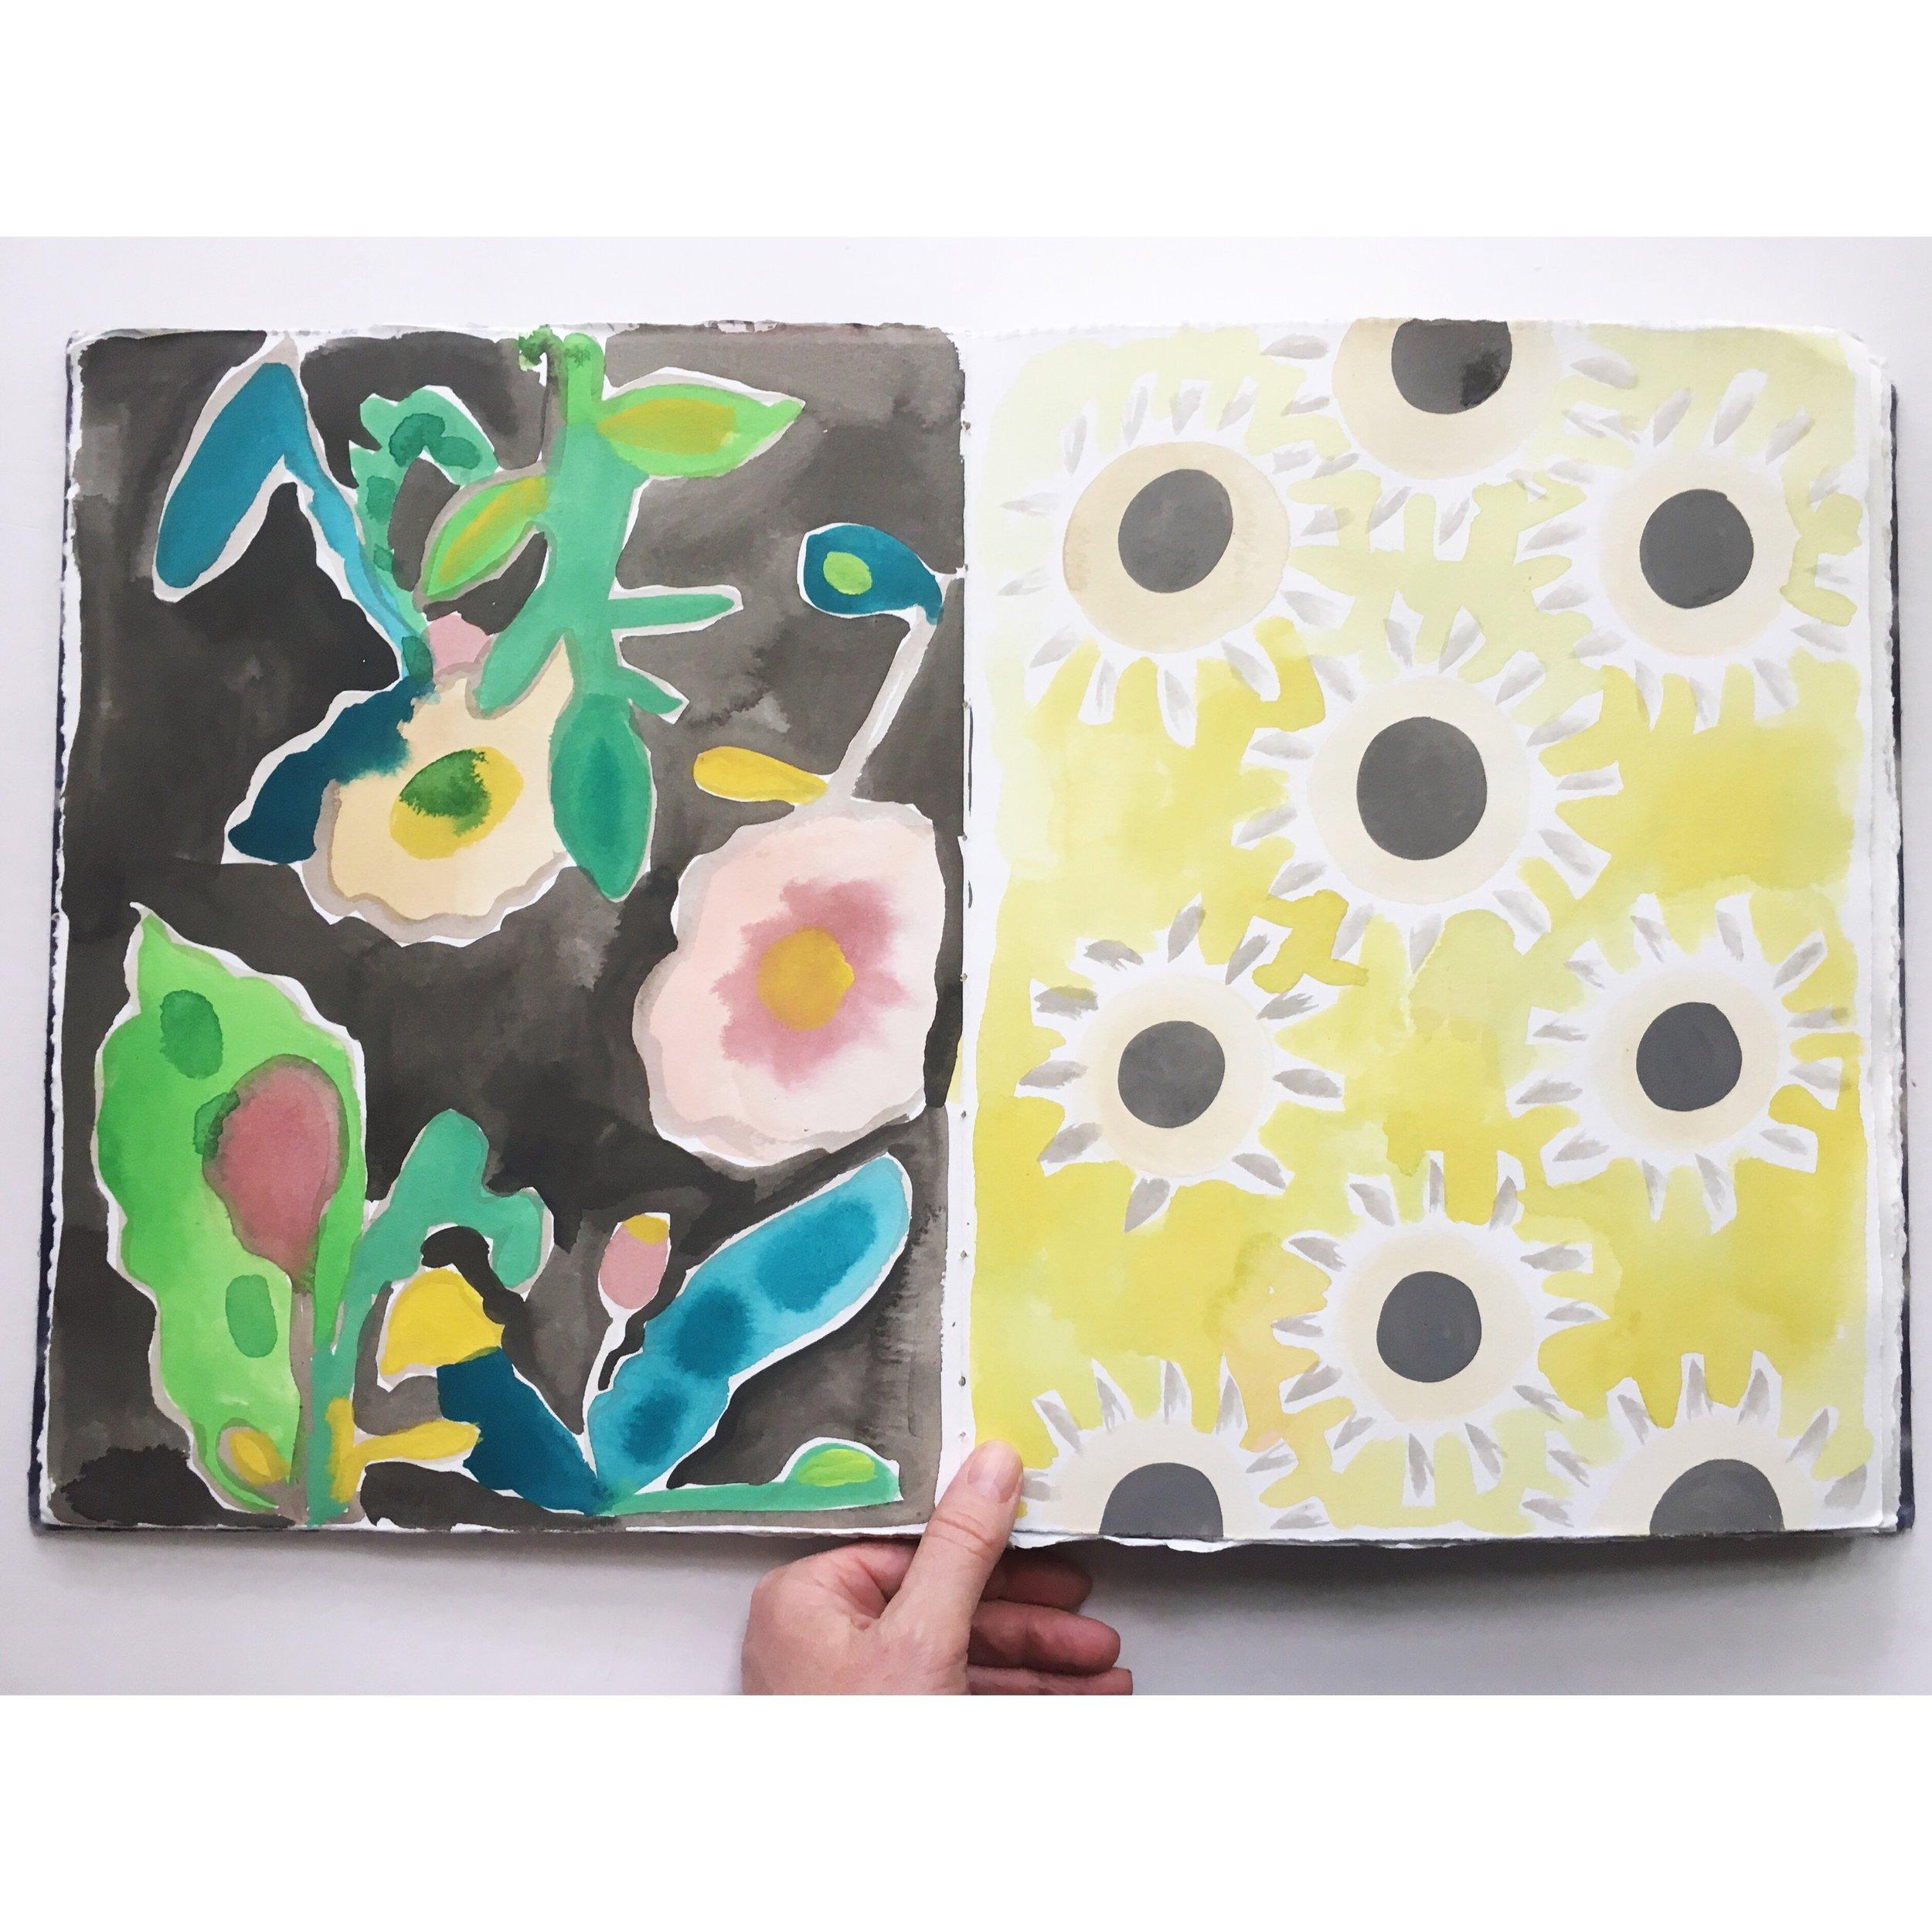 flower and sun patterns.JPG